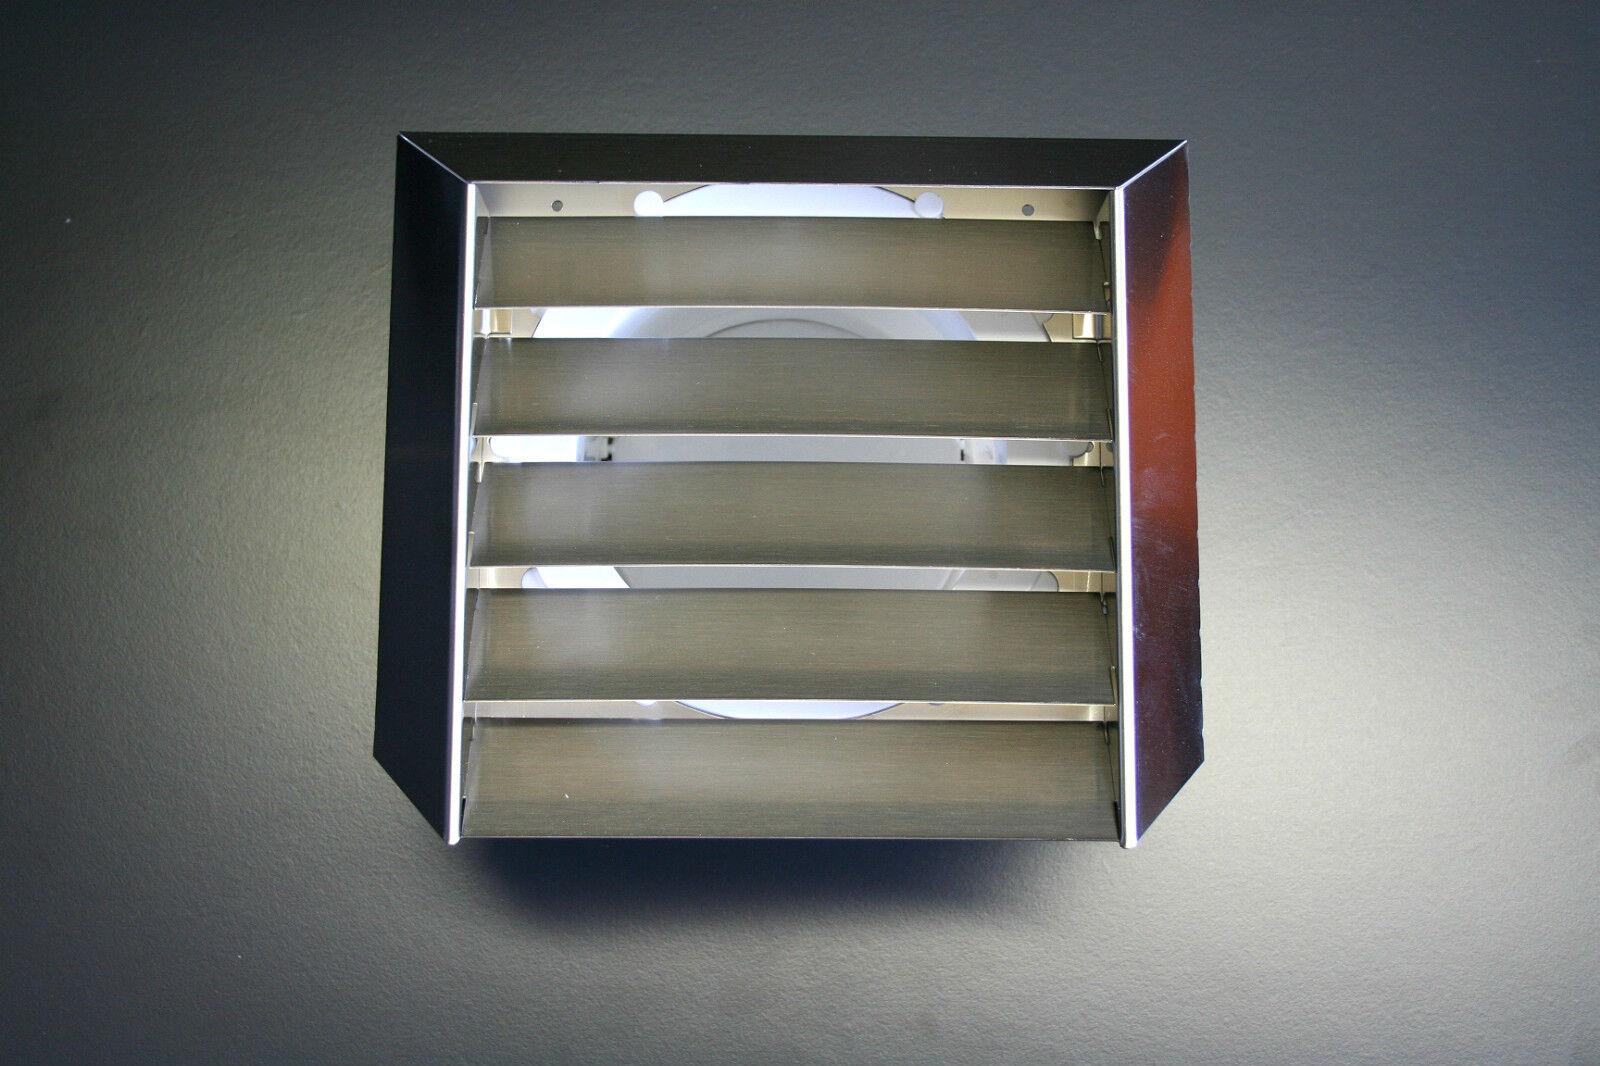 mauerkasten 100 mm edelstahl r ckstauklappe rundanschlu abluft dunstabzug k che eur 72 90. Black Bedroom Furniture Sets. Home Design Ideas